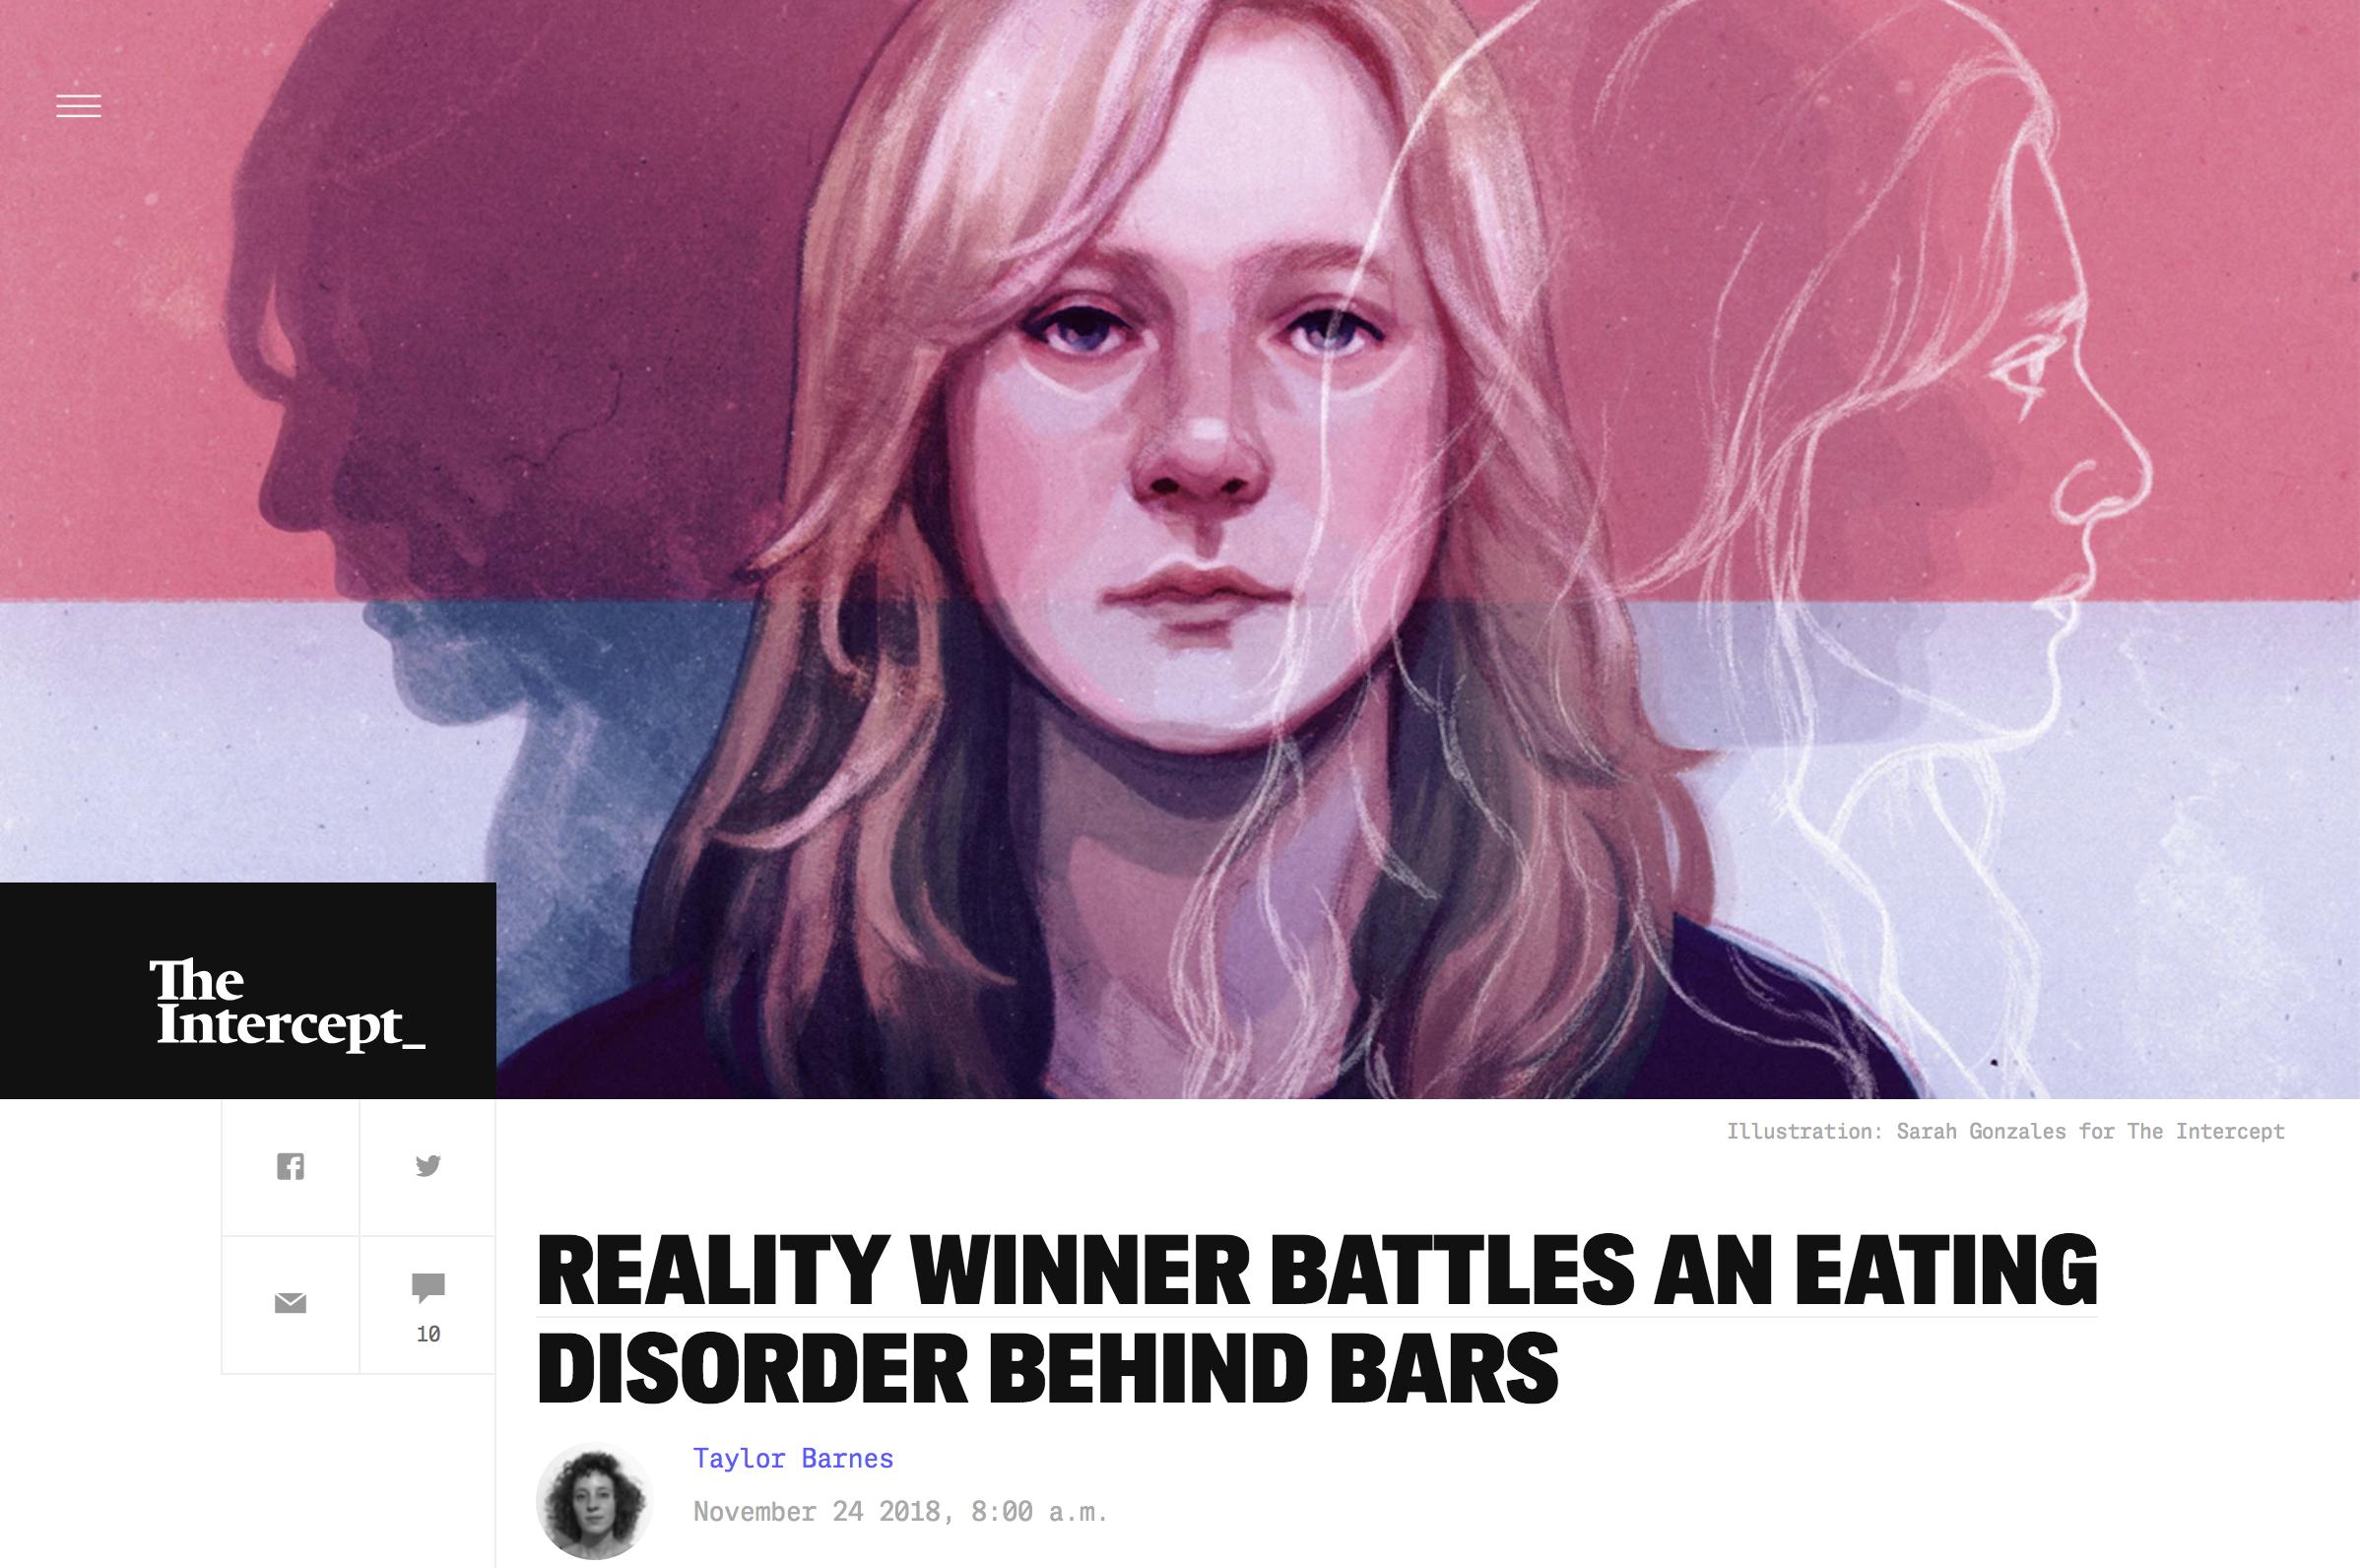 Illustration:  Sarah Gonzales   Art Direction: Ariel Zambelich  Story:   Reality Winner Battles An Eating Disorder Behind Bars